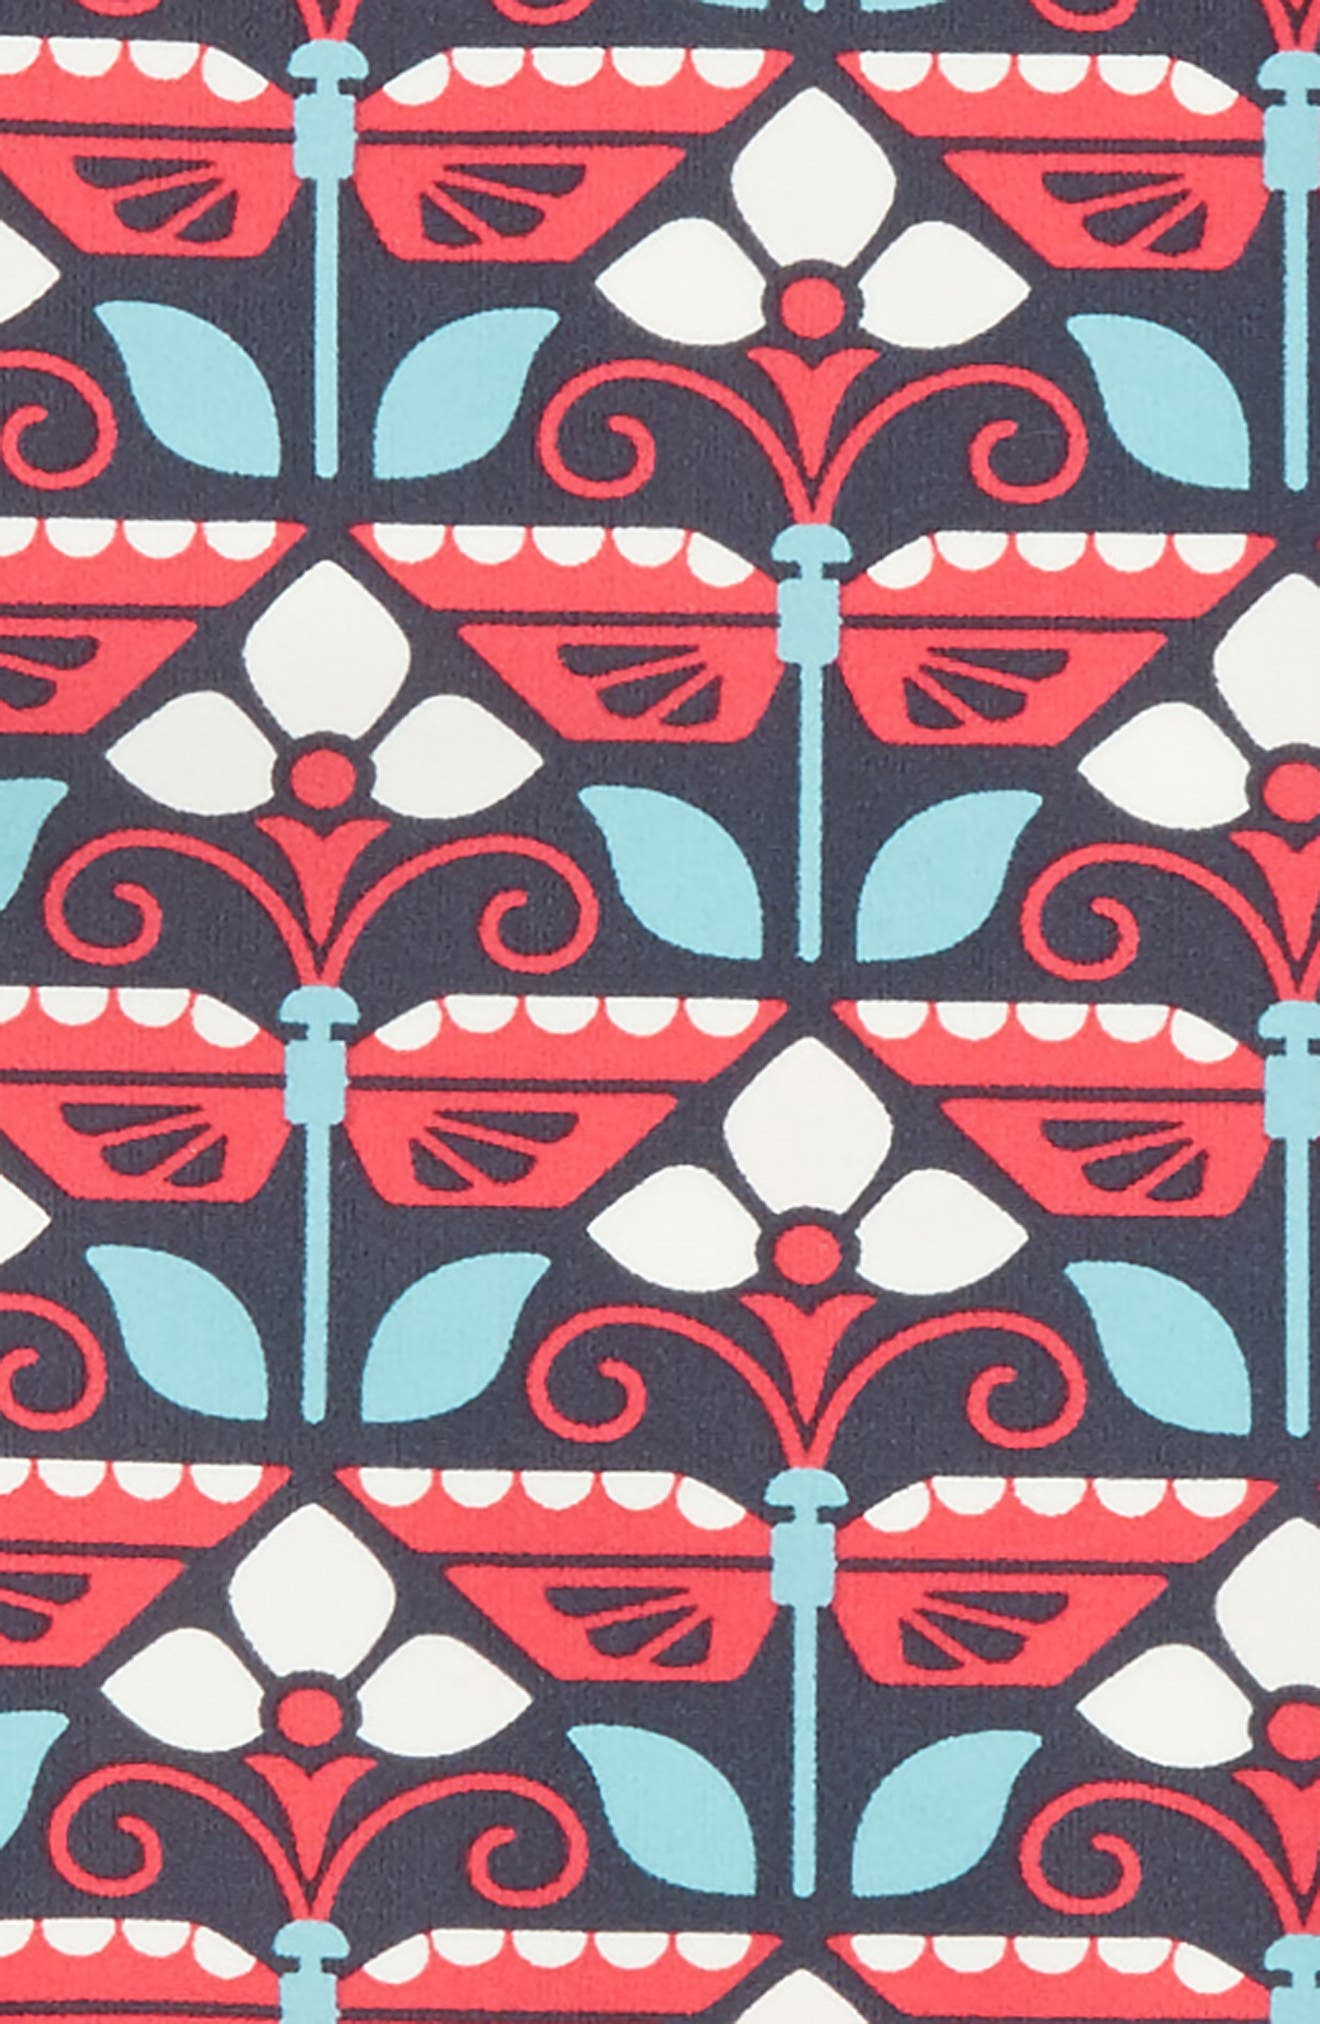 Kaleidoscope Two-Piece Rashguard Swimsuit,                             Alternate thumbnail 2, color,                             411